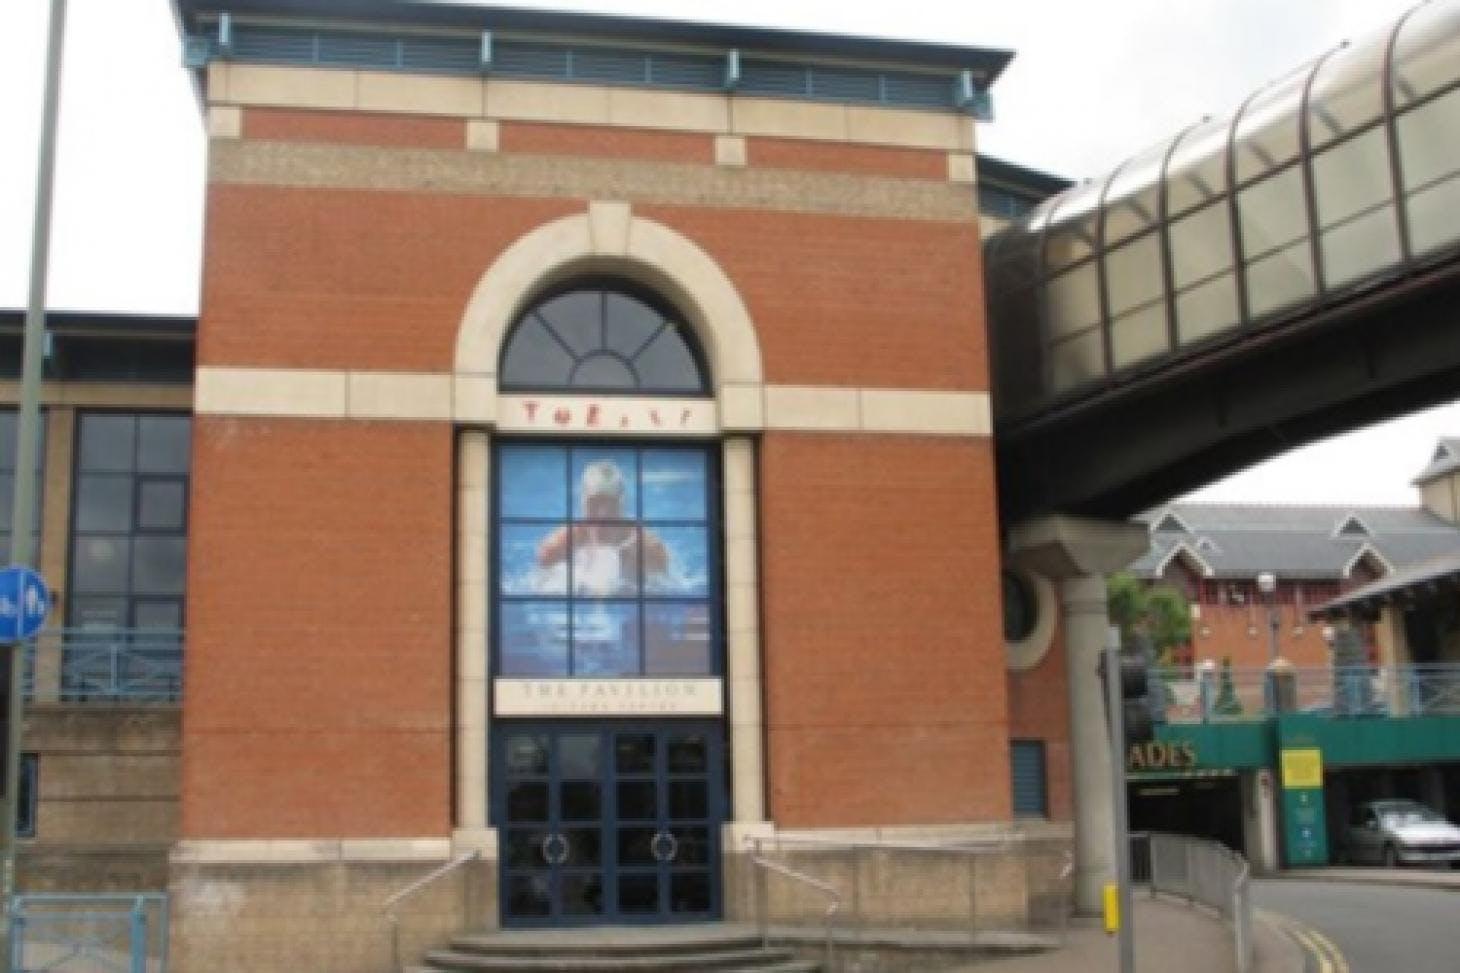 Pavilion Leisure Centre Indoor swimming pool